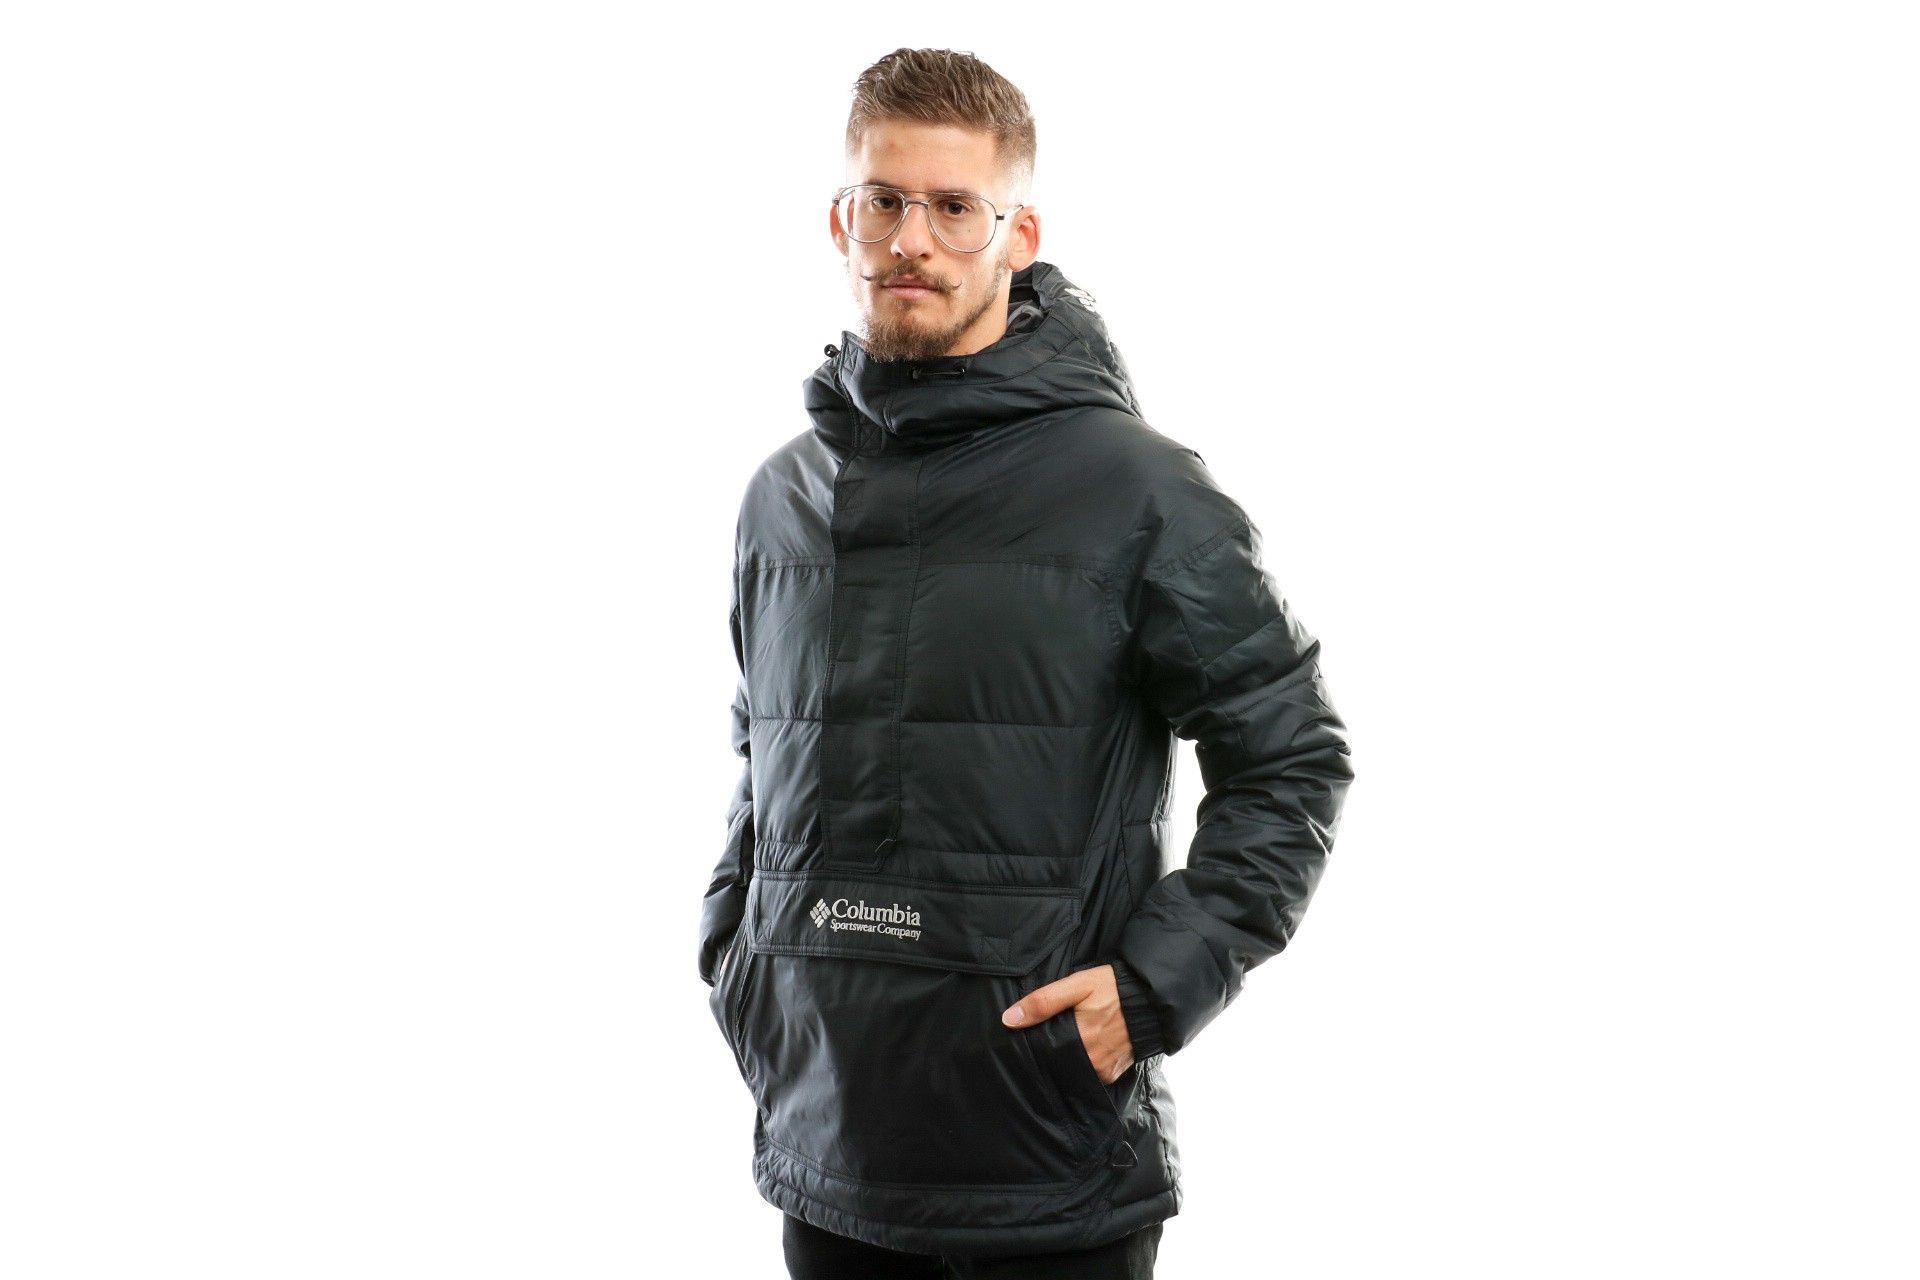 Afbeelding van Columbia Columbia Lodge™ Pullover Jacket 1864422 Jacket Black